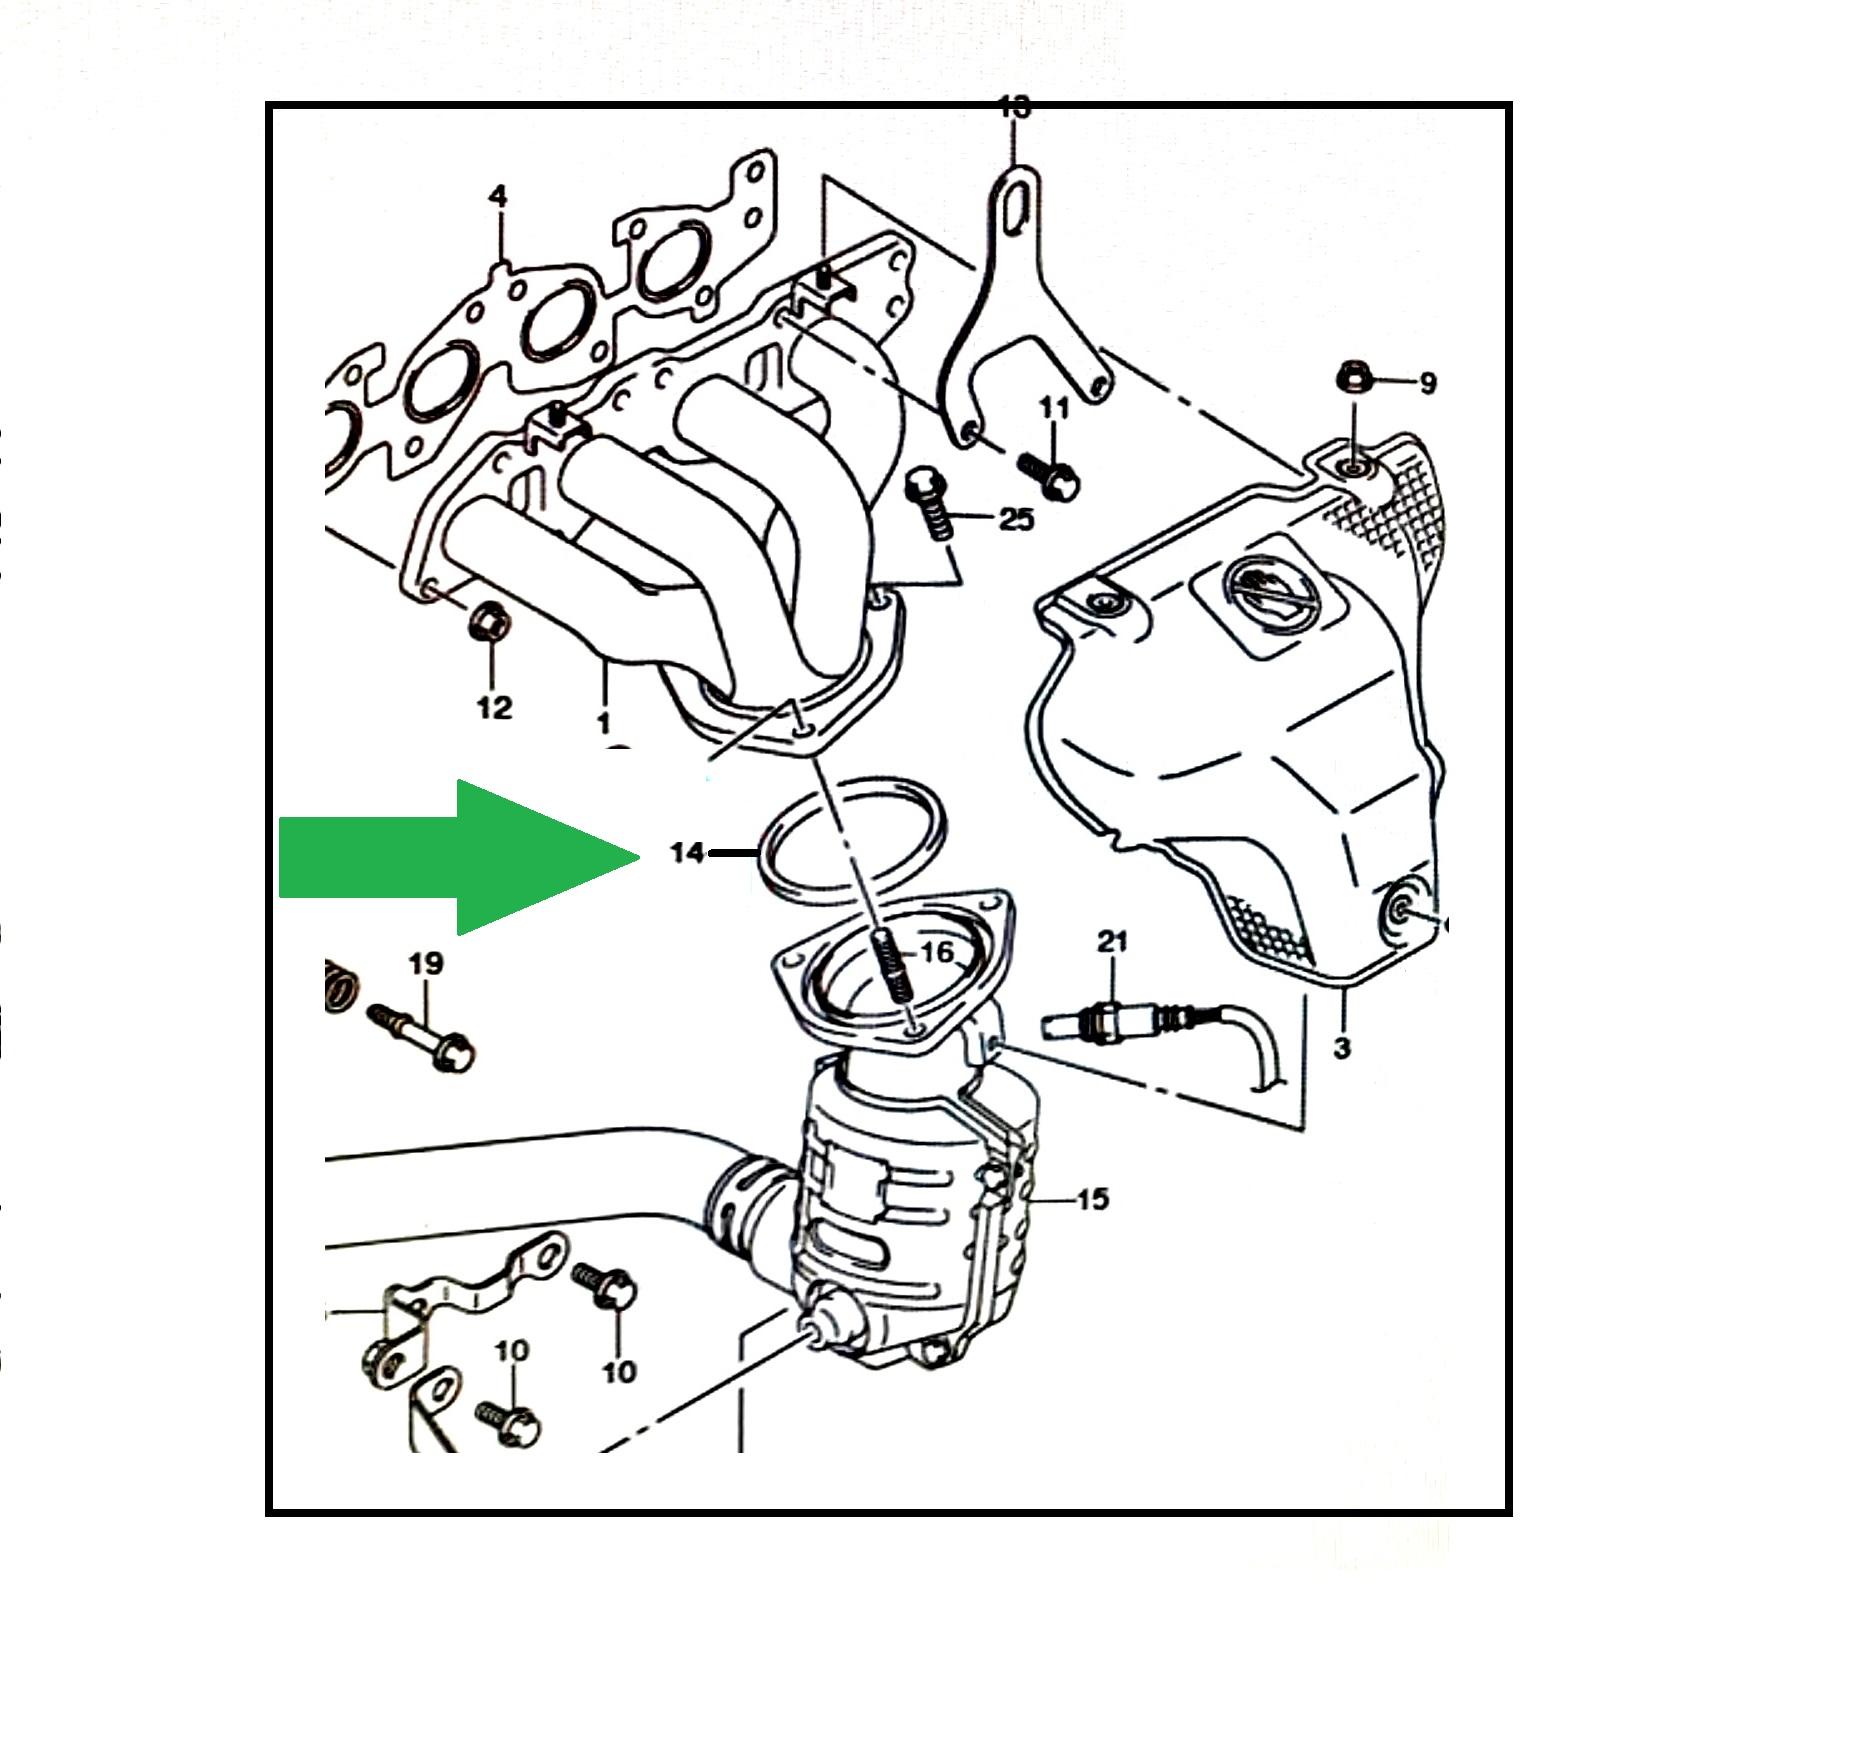 Anel do Escapamento Suzuki SX4 2.0 16V